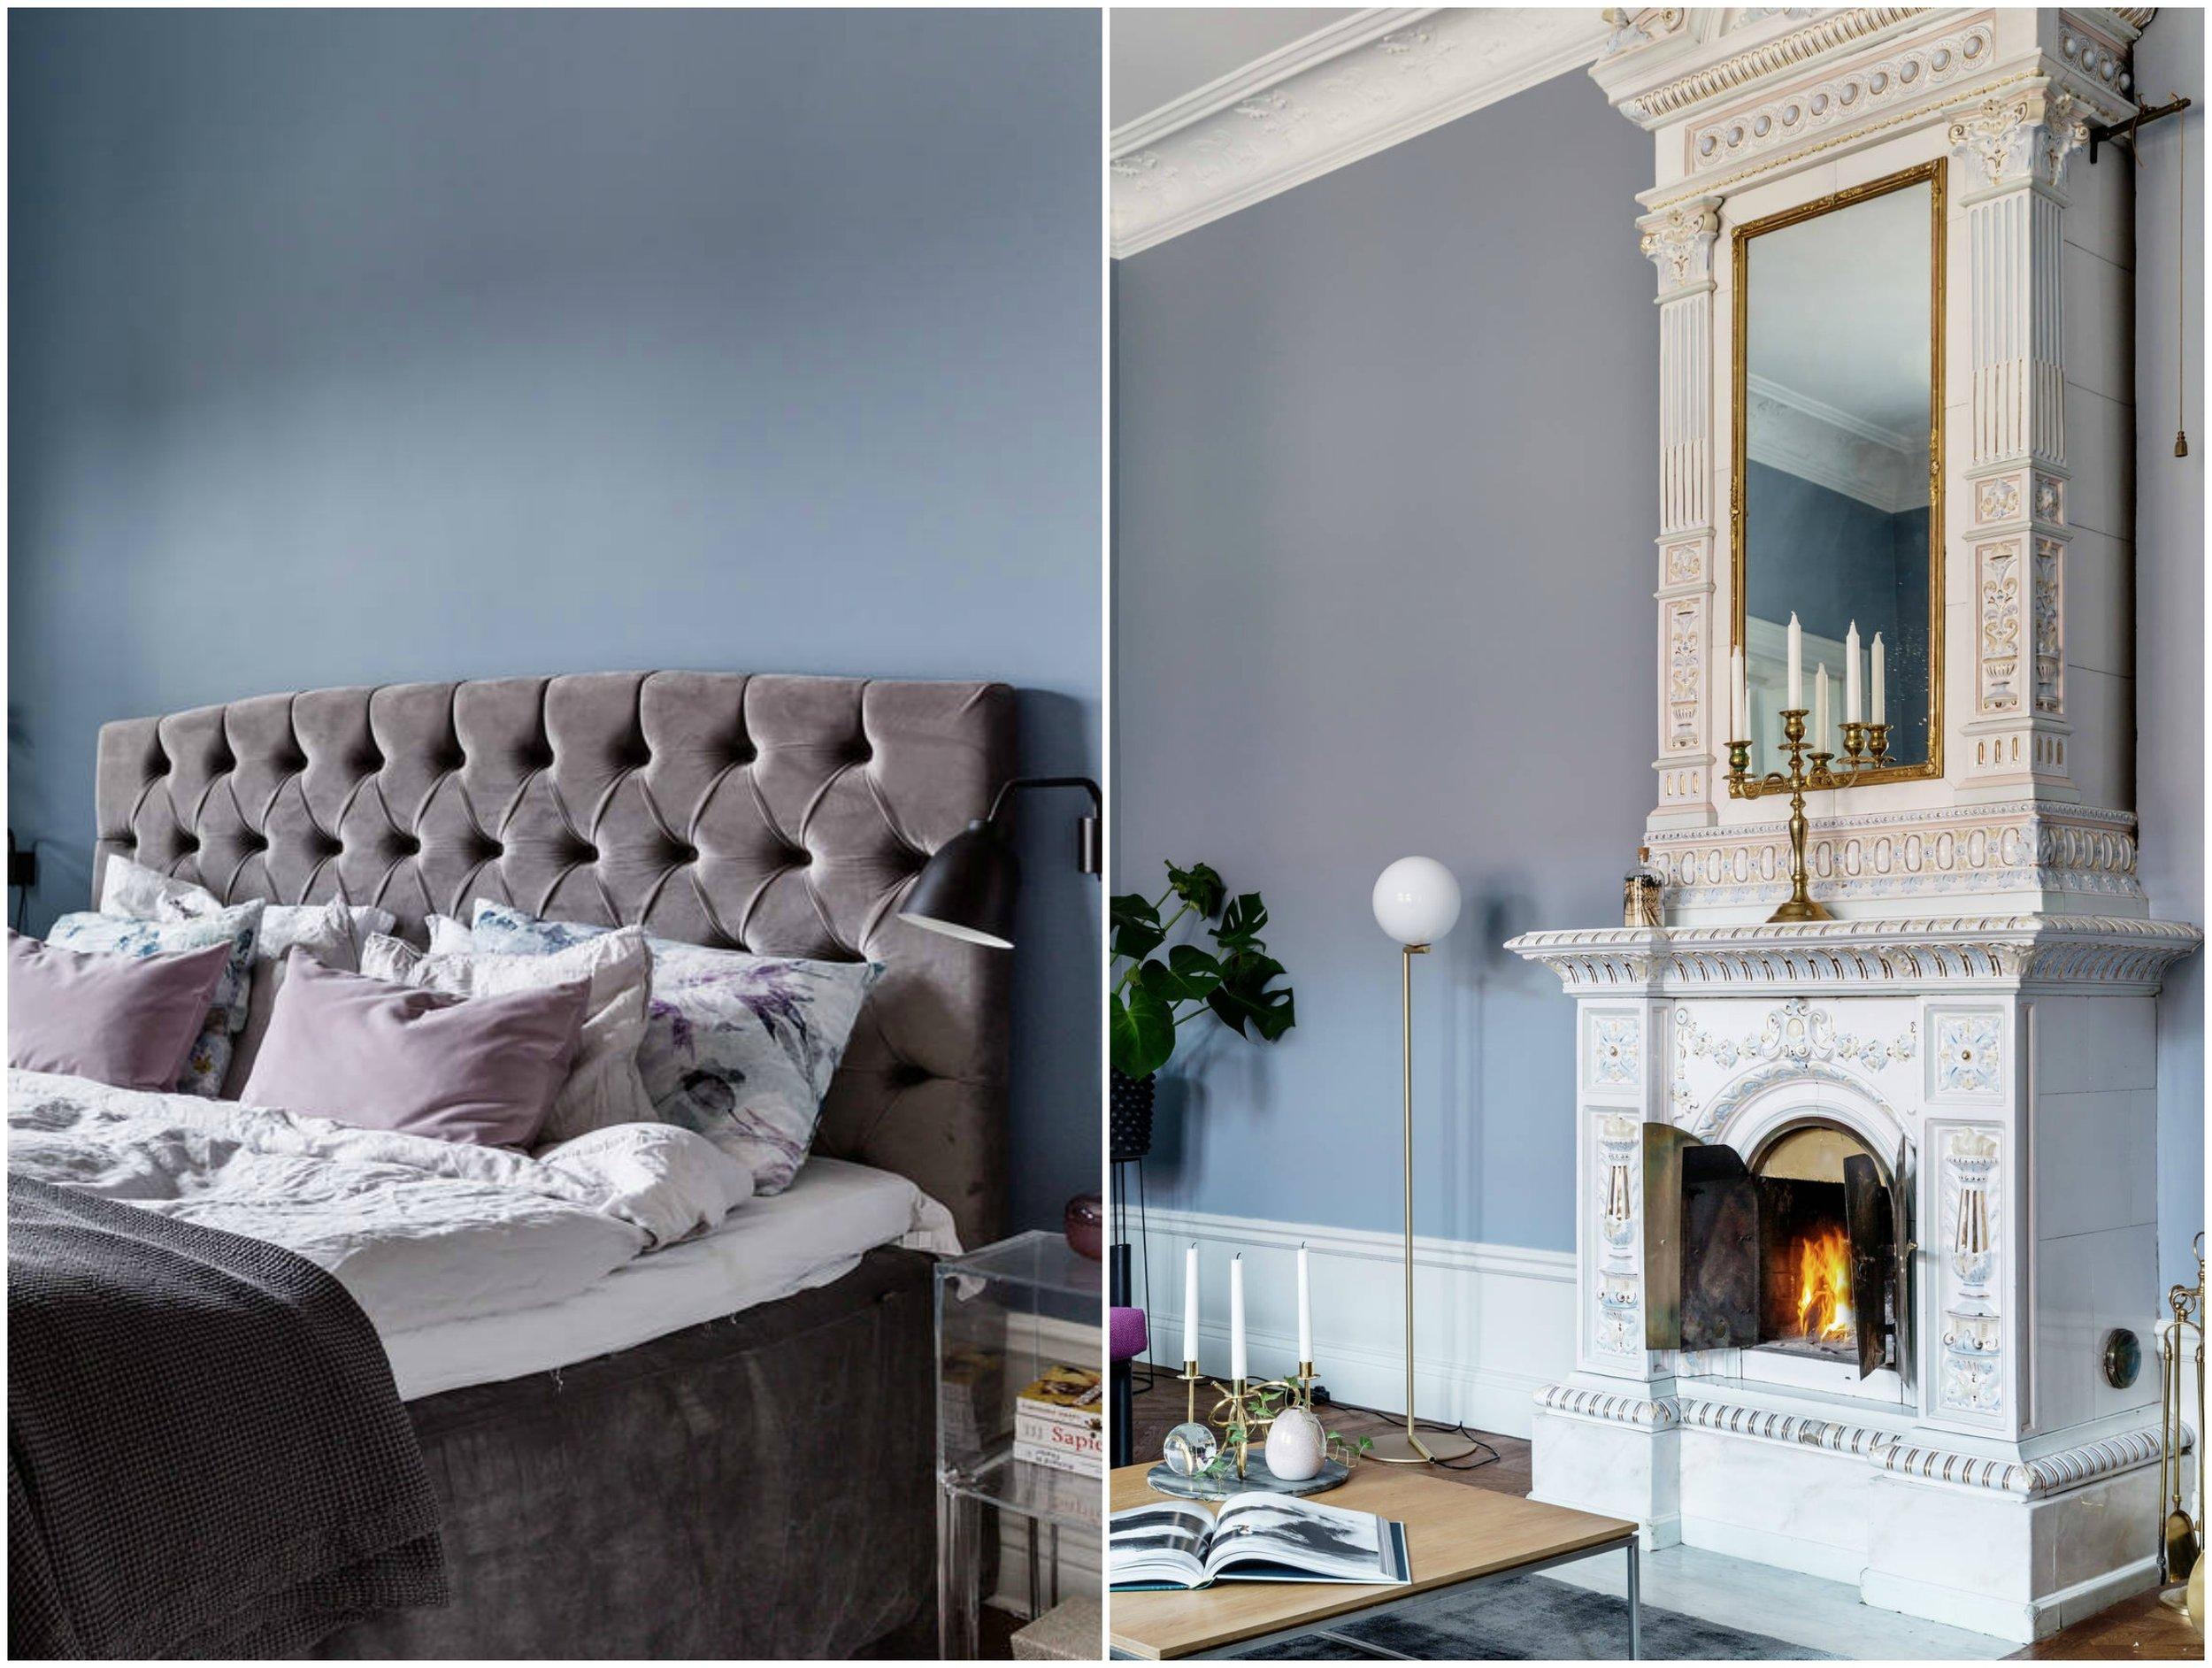 sofia cm interior blog blue color swedish homes apartment style scandinavian bedding